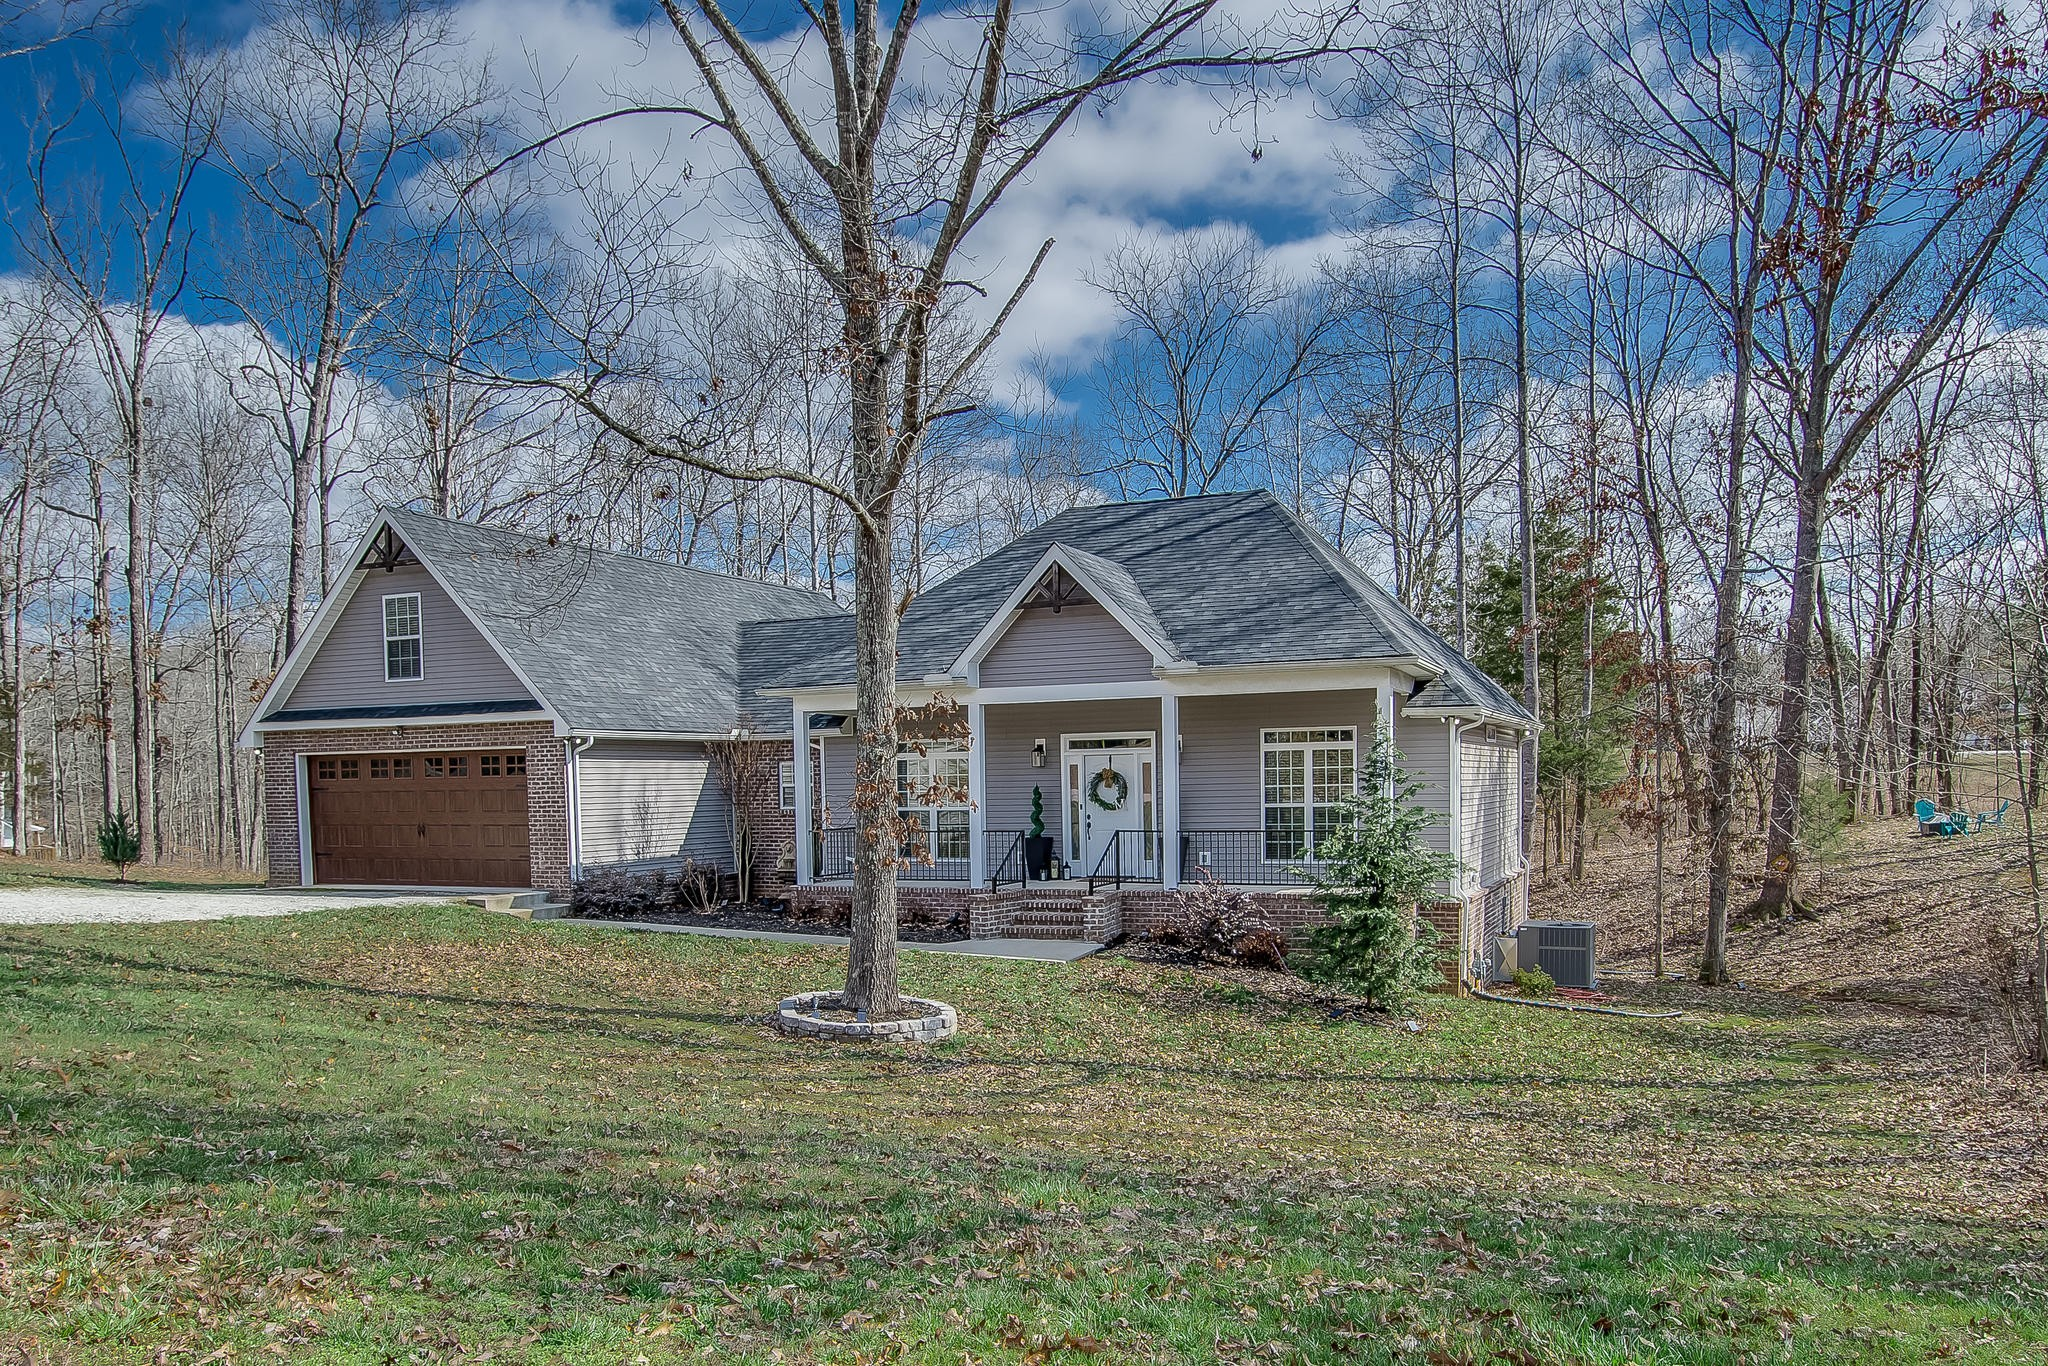 528 Aubrey Ln, Burns, TN 37029 - Burns, TN real estate listing